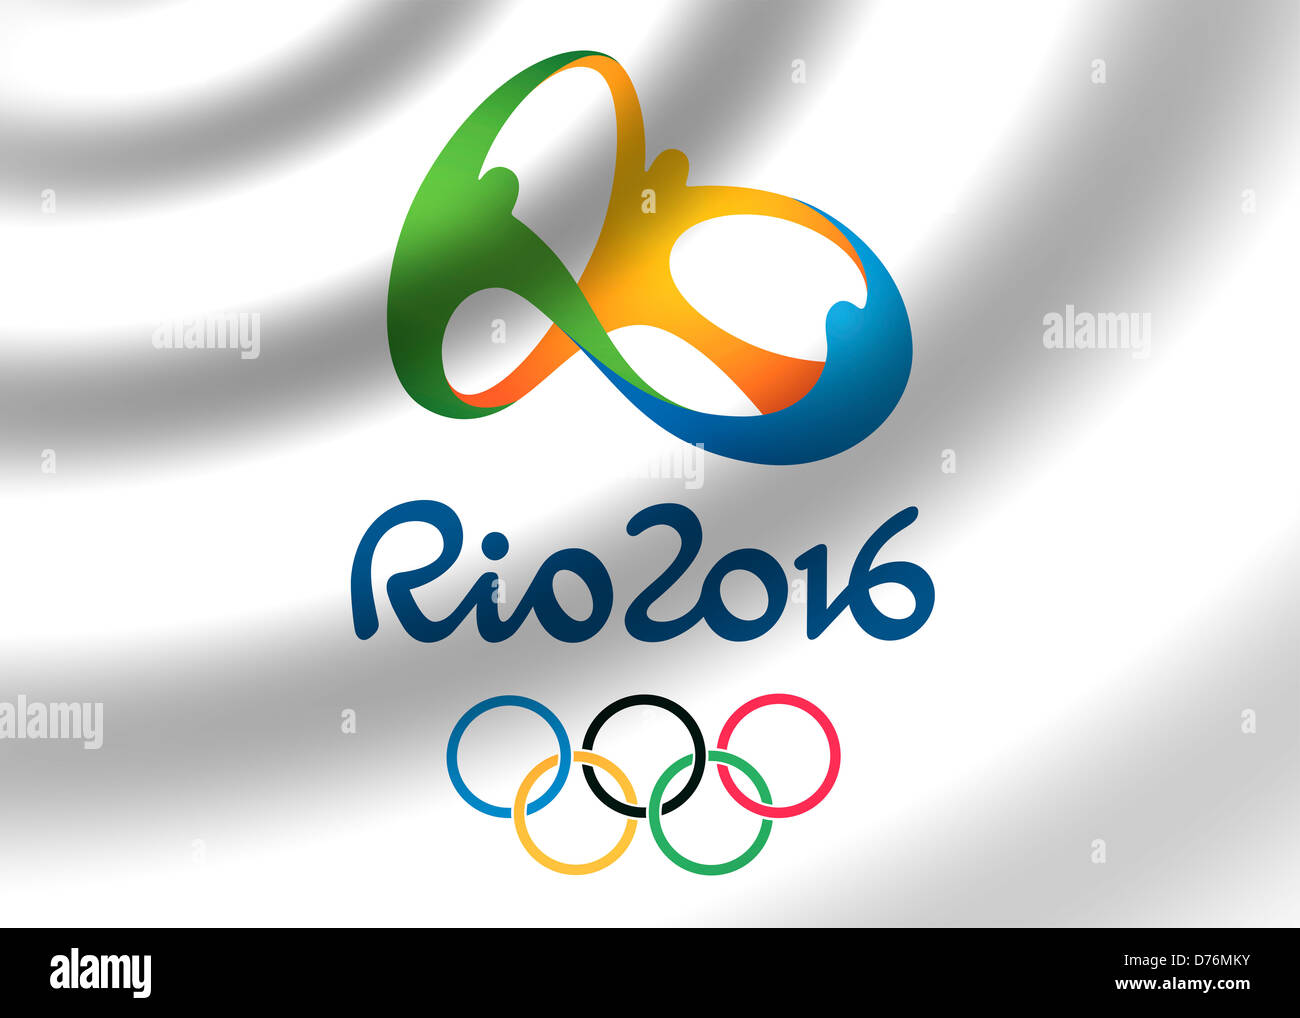 Rio 2016 olympic games summer rio de janeiro logo symbol flag rio 2016 olympic games summer rio de janeiro logo symbol flag icon biocorpaavc